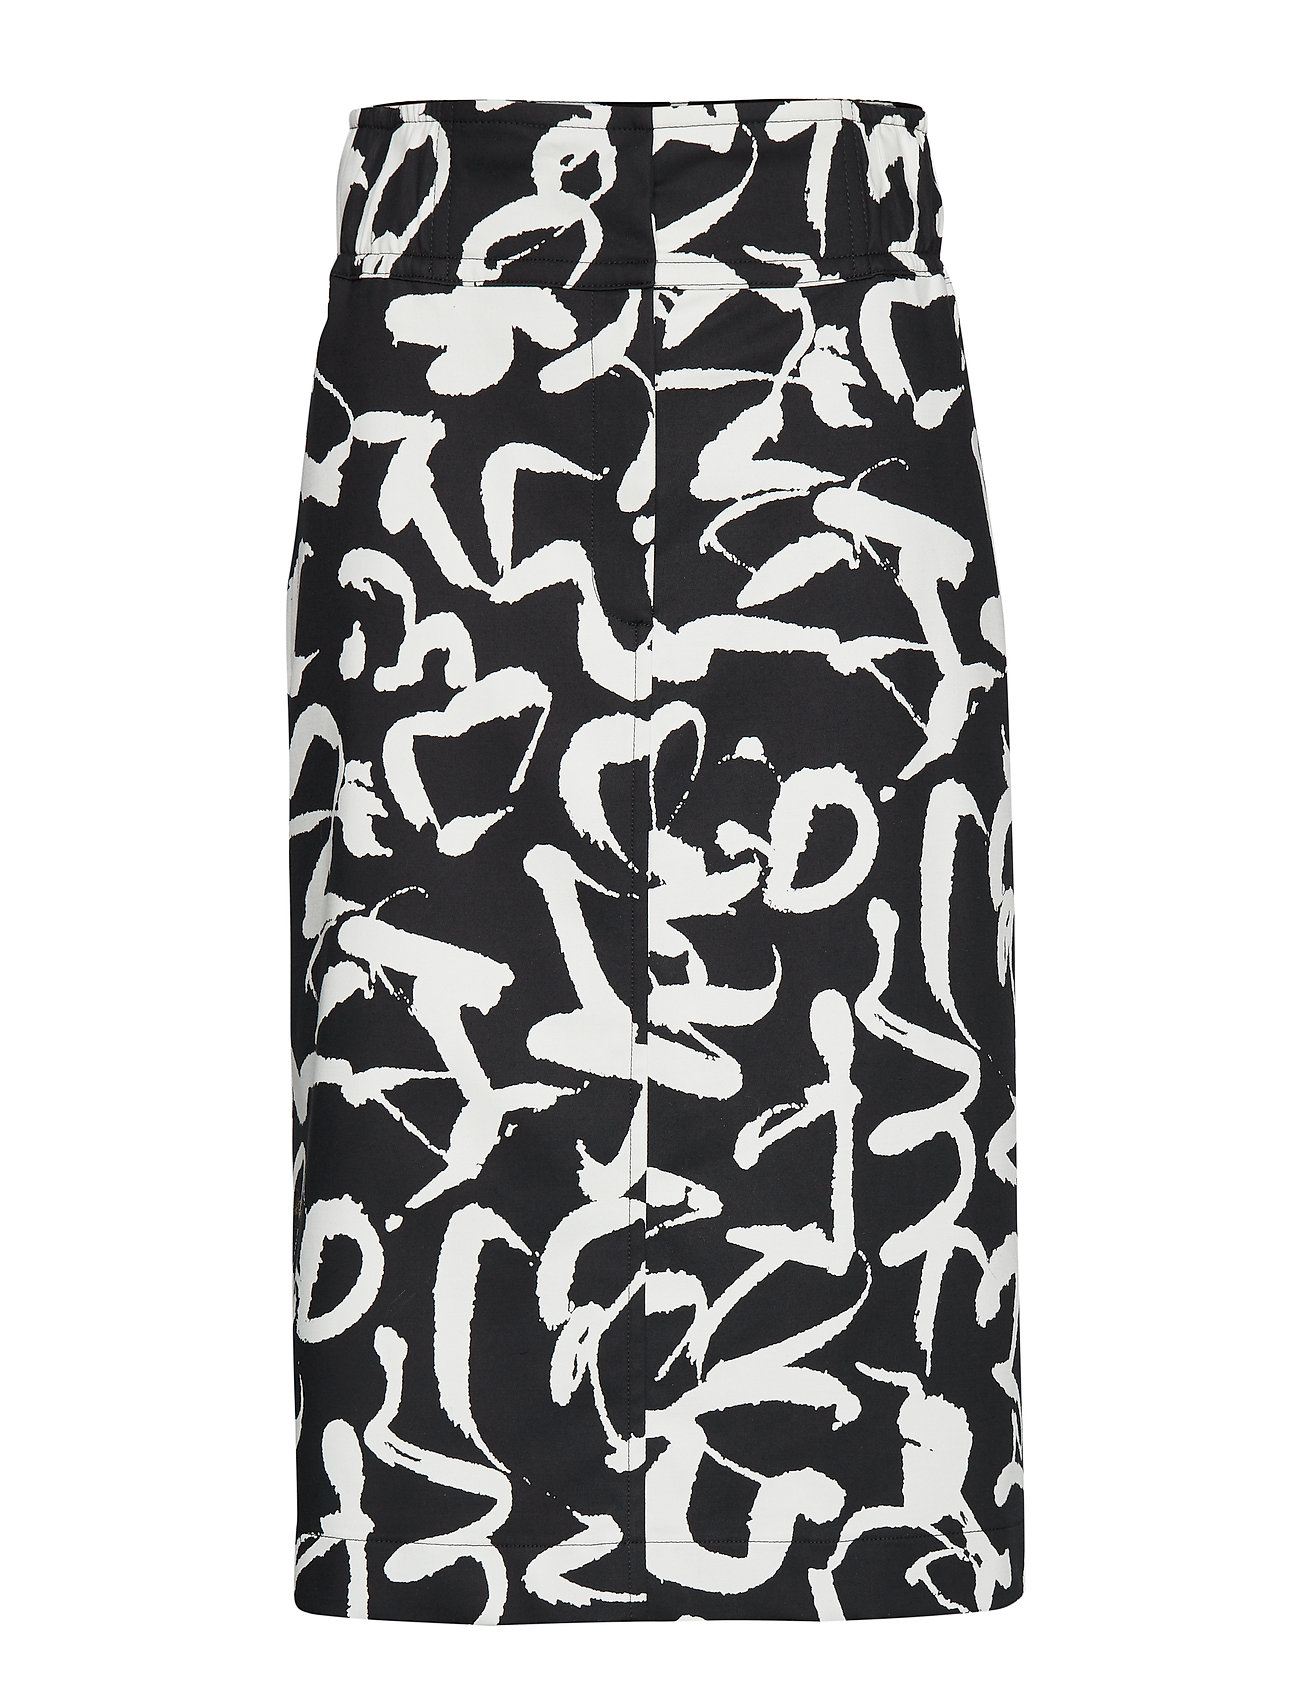 Marimekko DULA HARHA Skirt - BLACK, OFF-WHITE